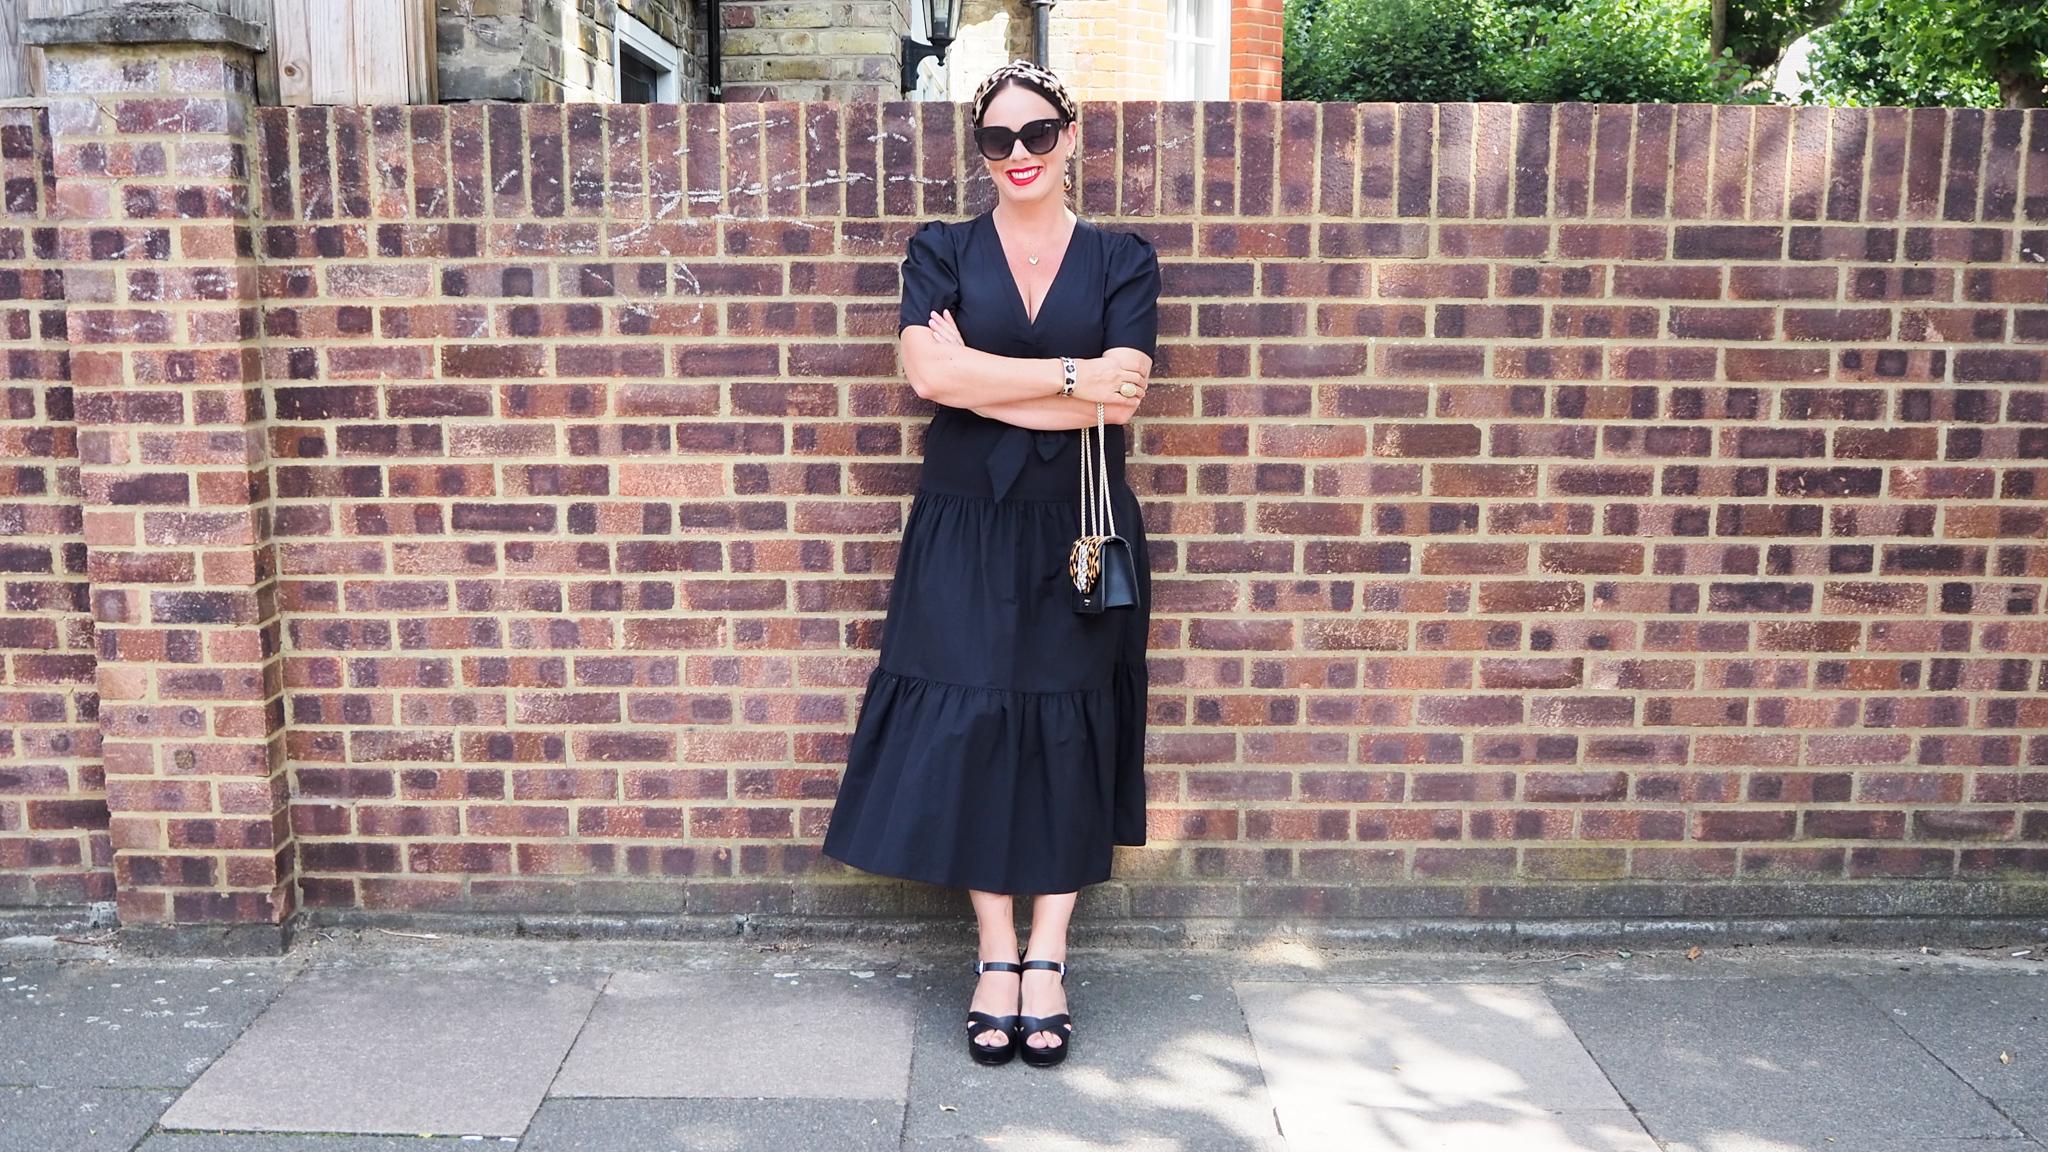 Black v-neck tiered ASOS dress